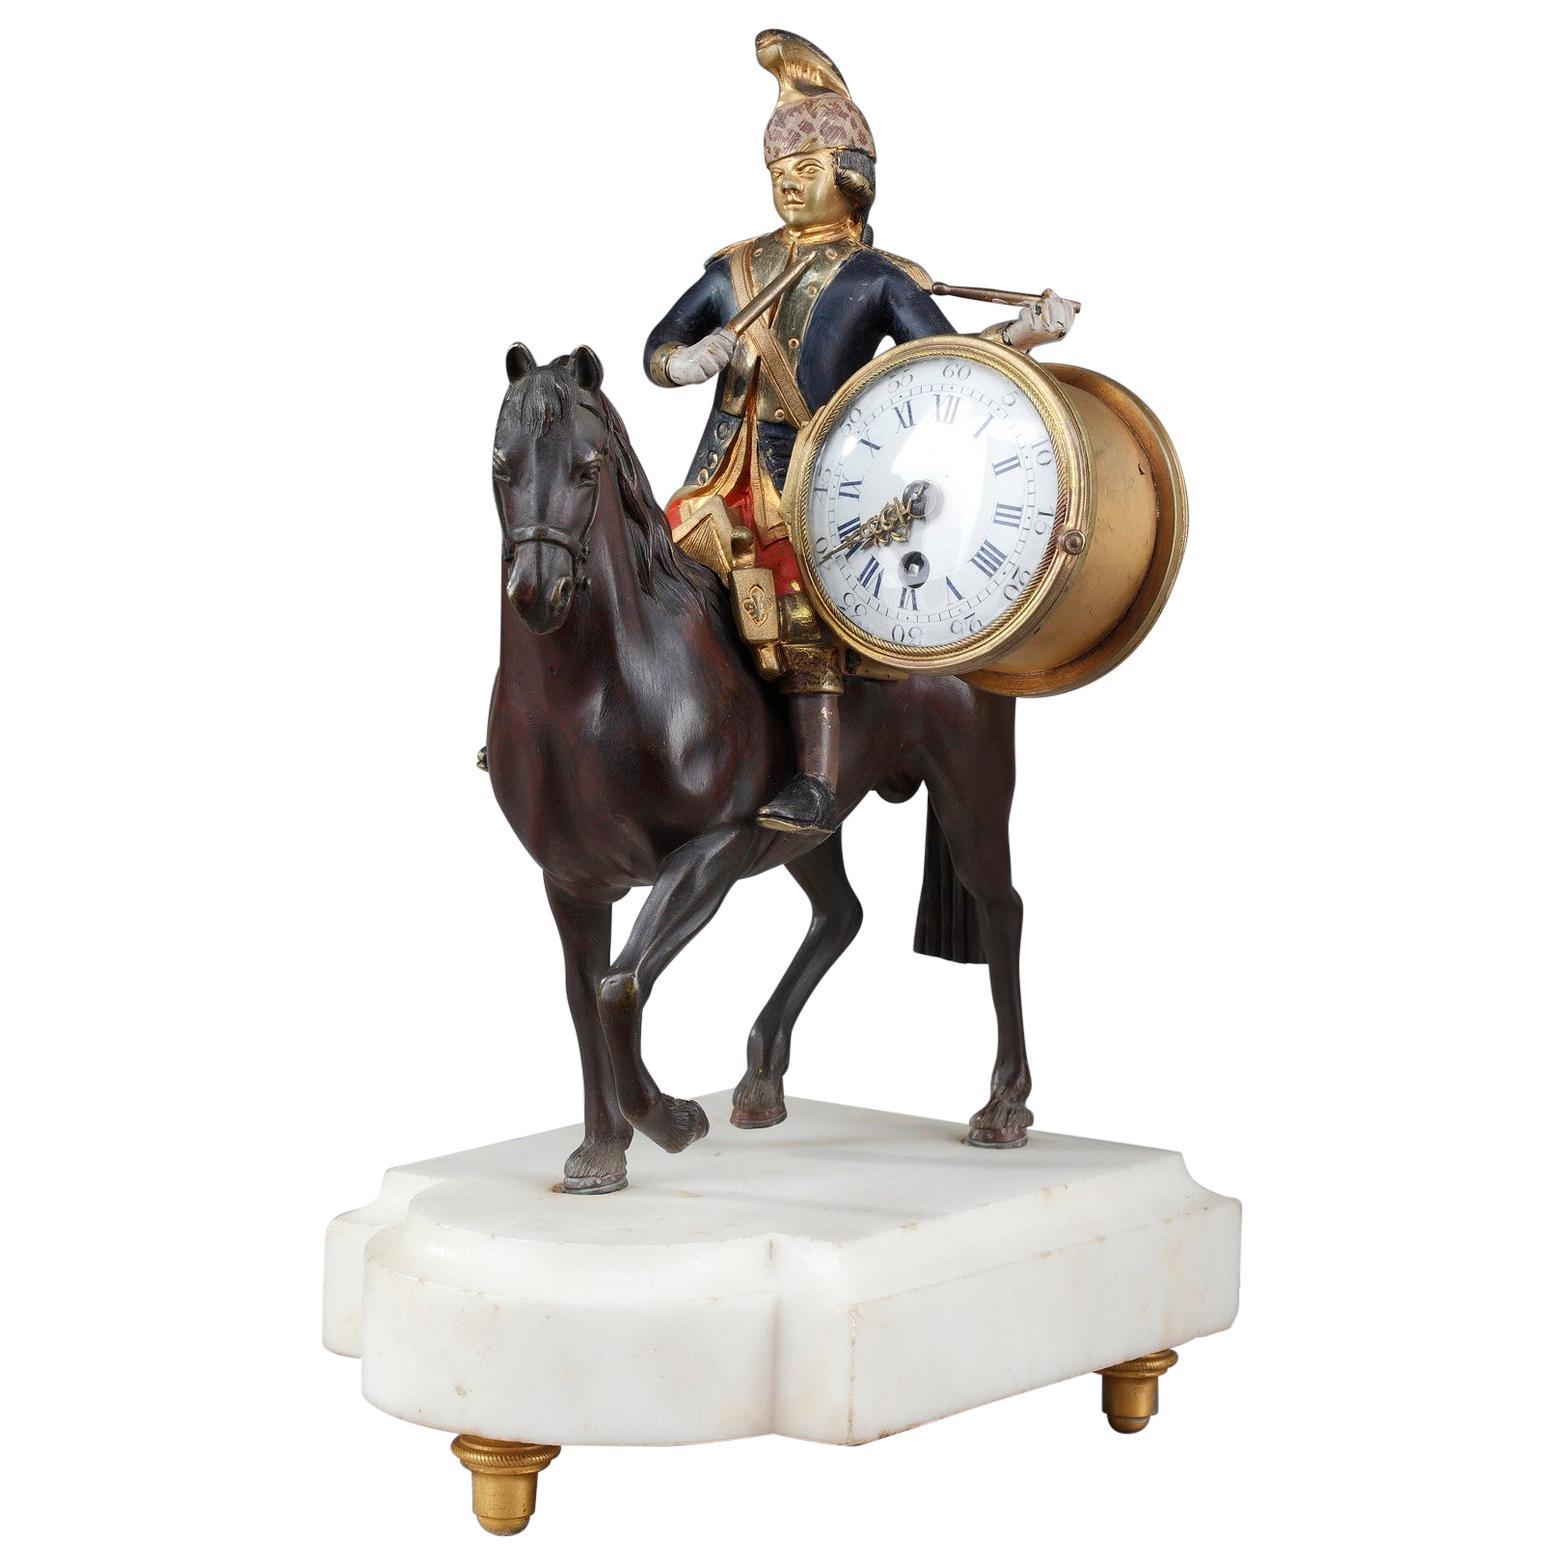 18th Century Louis XVI Clock Soldier on Horseback